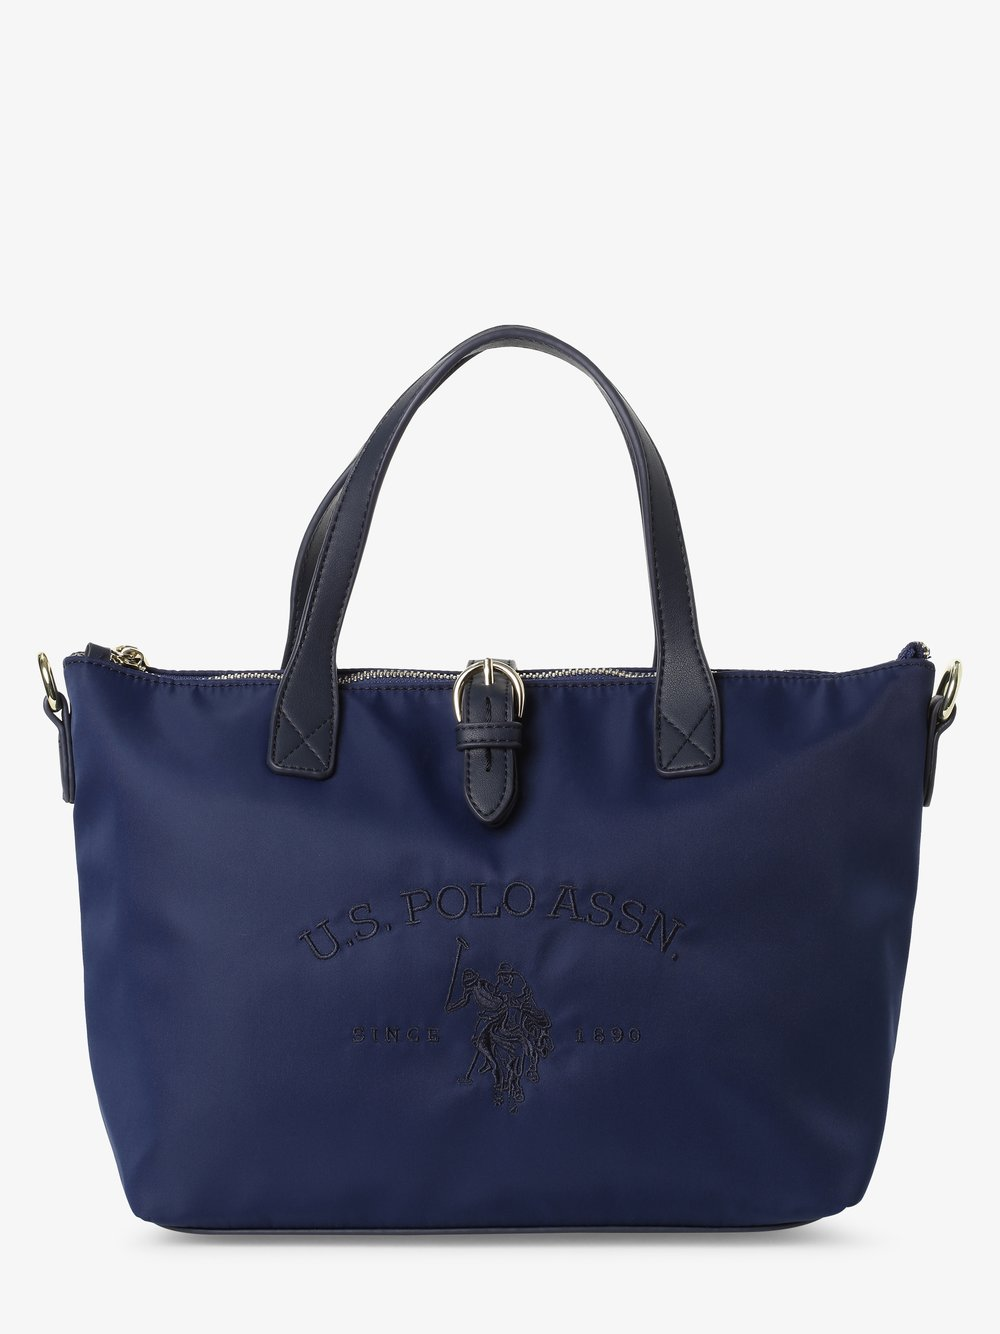 U.S. Polo Assn. – Torebka damska, niebieski Van Graaf 466426-0001